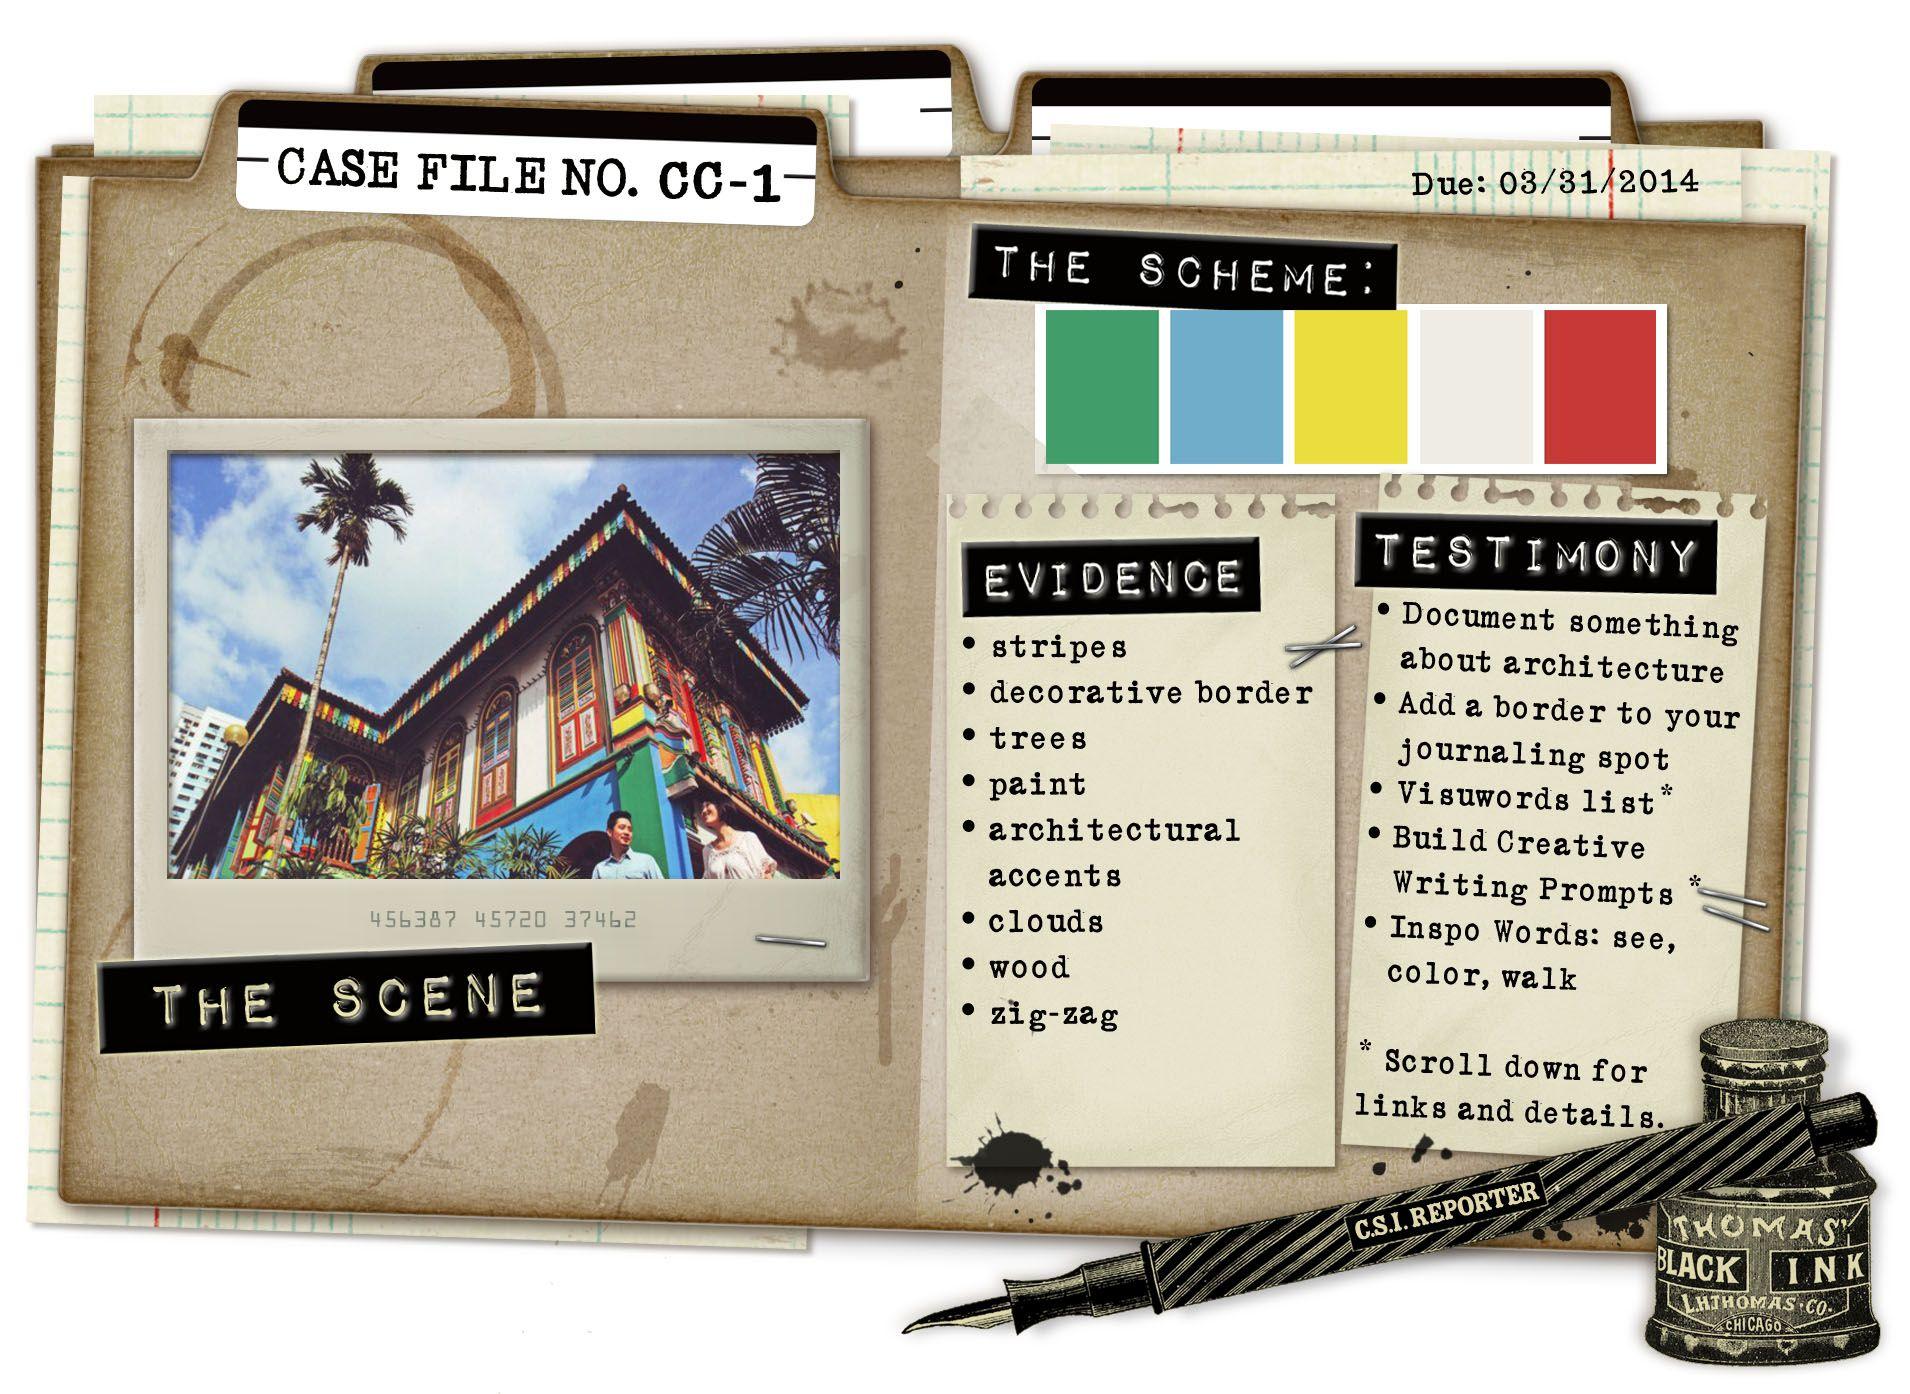 Pin By Csi Scrapbooking On Case File No Cc 1